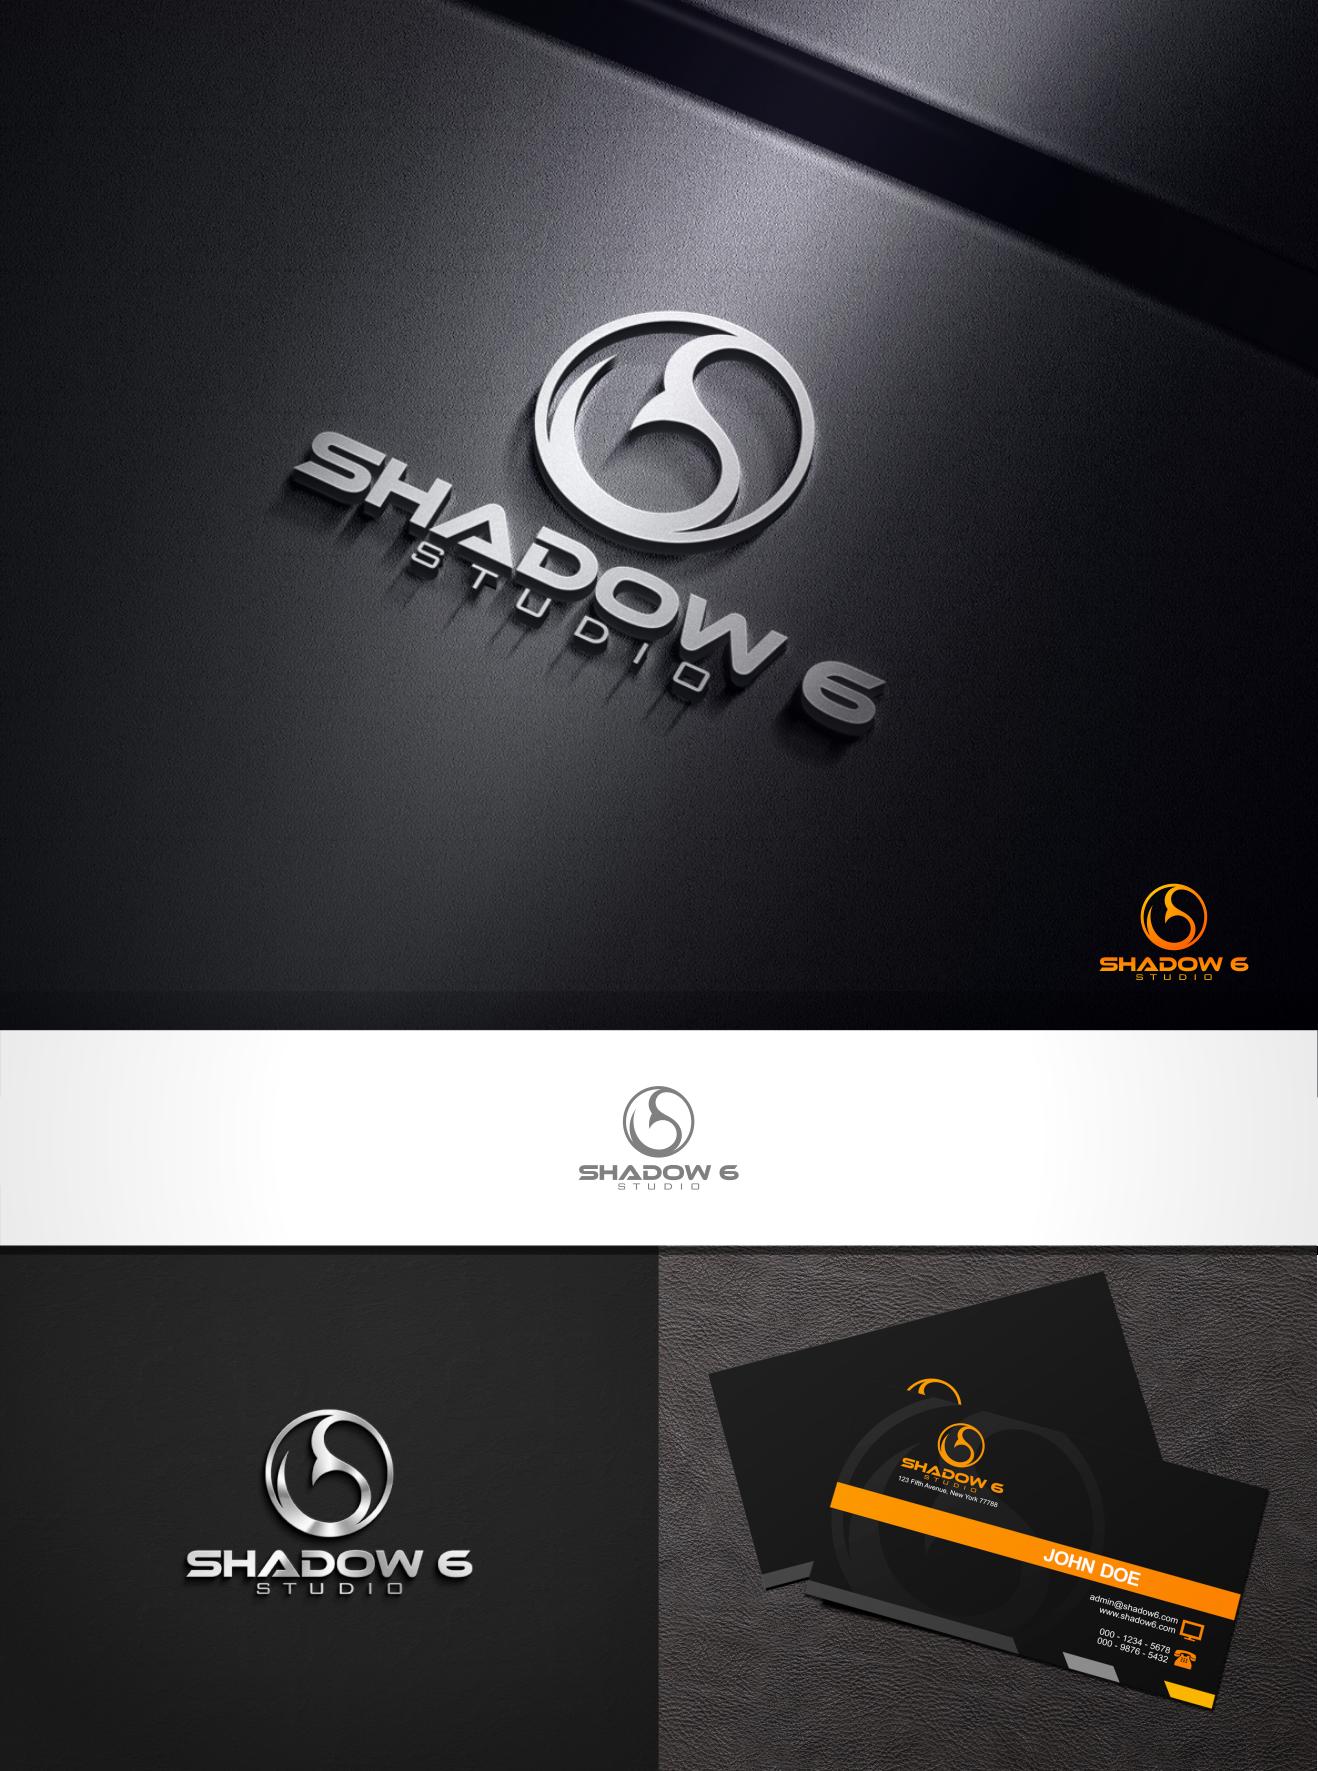 Design for creatives